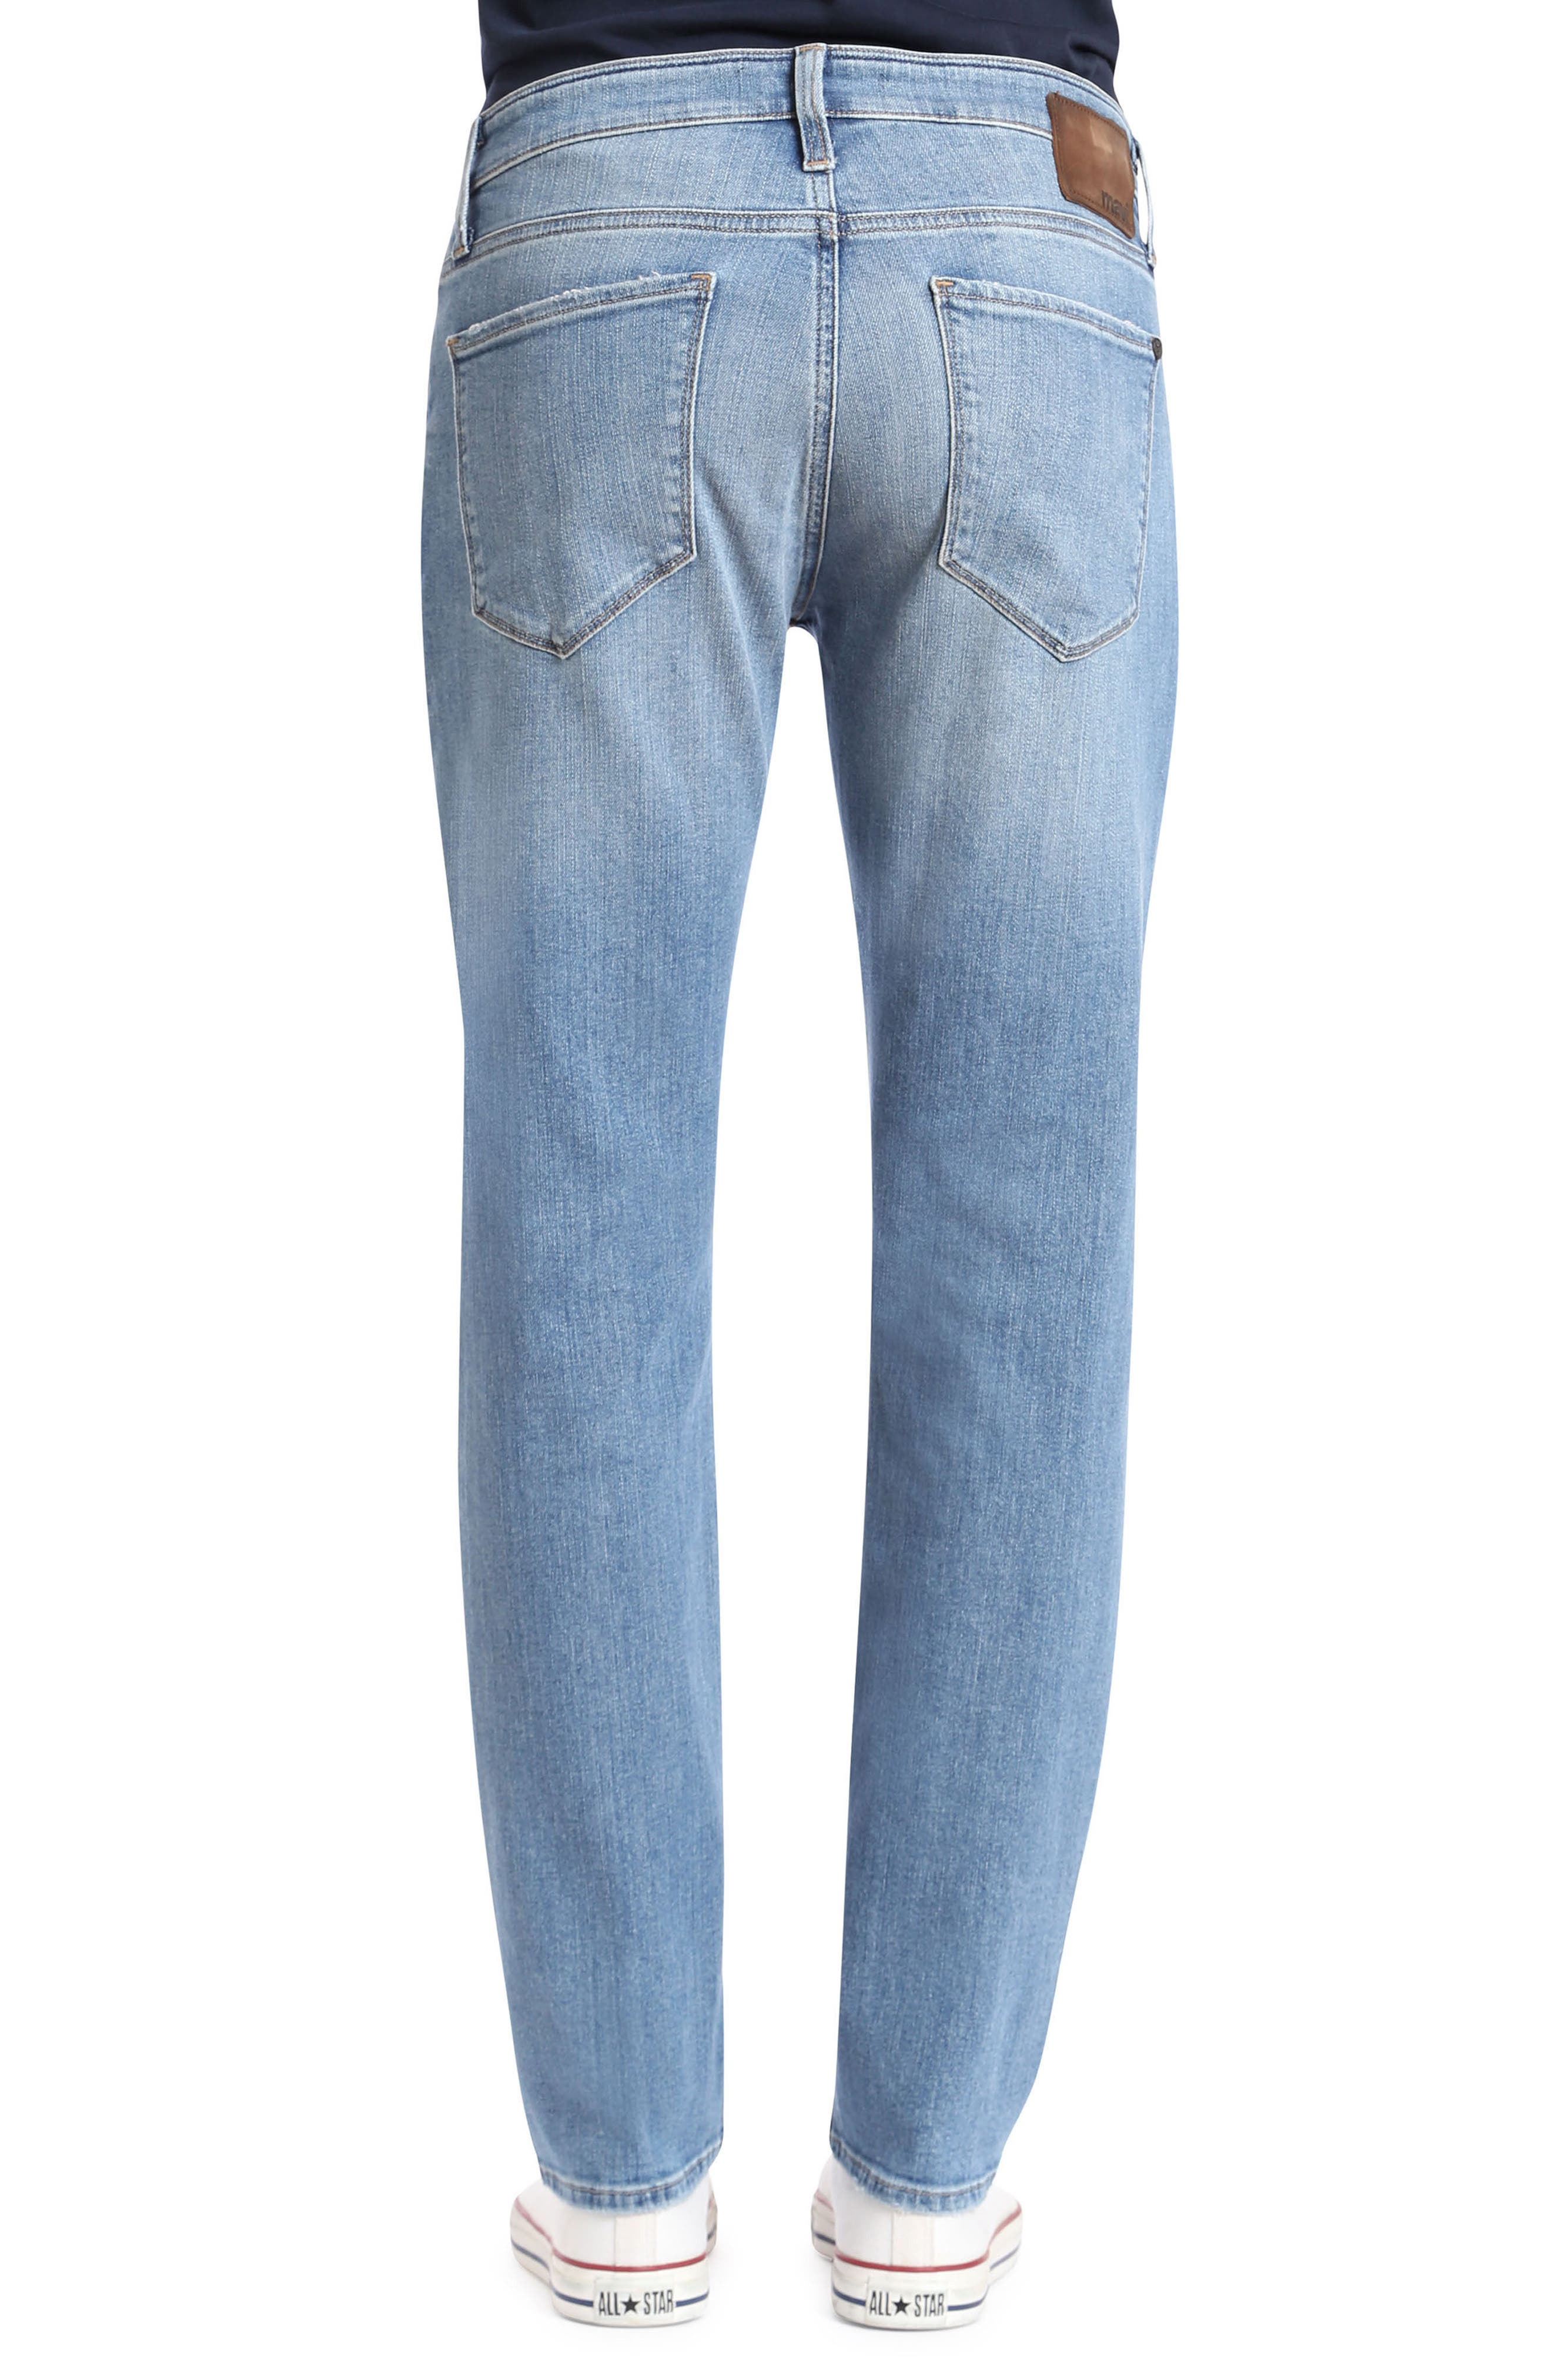 Marcus Slim Straight Leg Jeans,                             Alternate thumbnail 2, color,                             Light Used Authentic Vintage